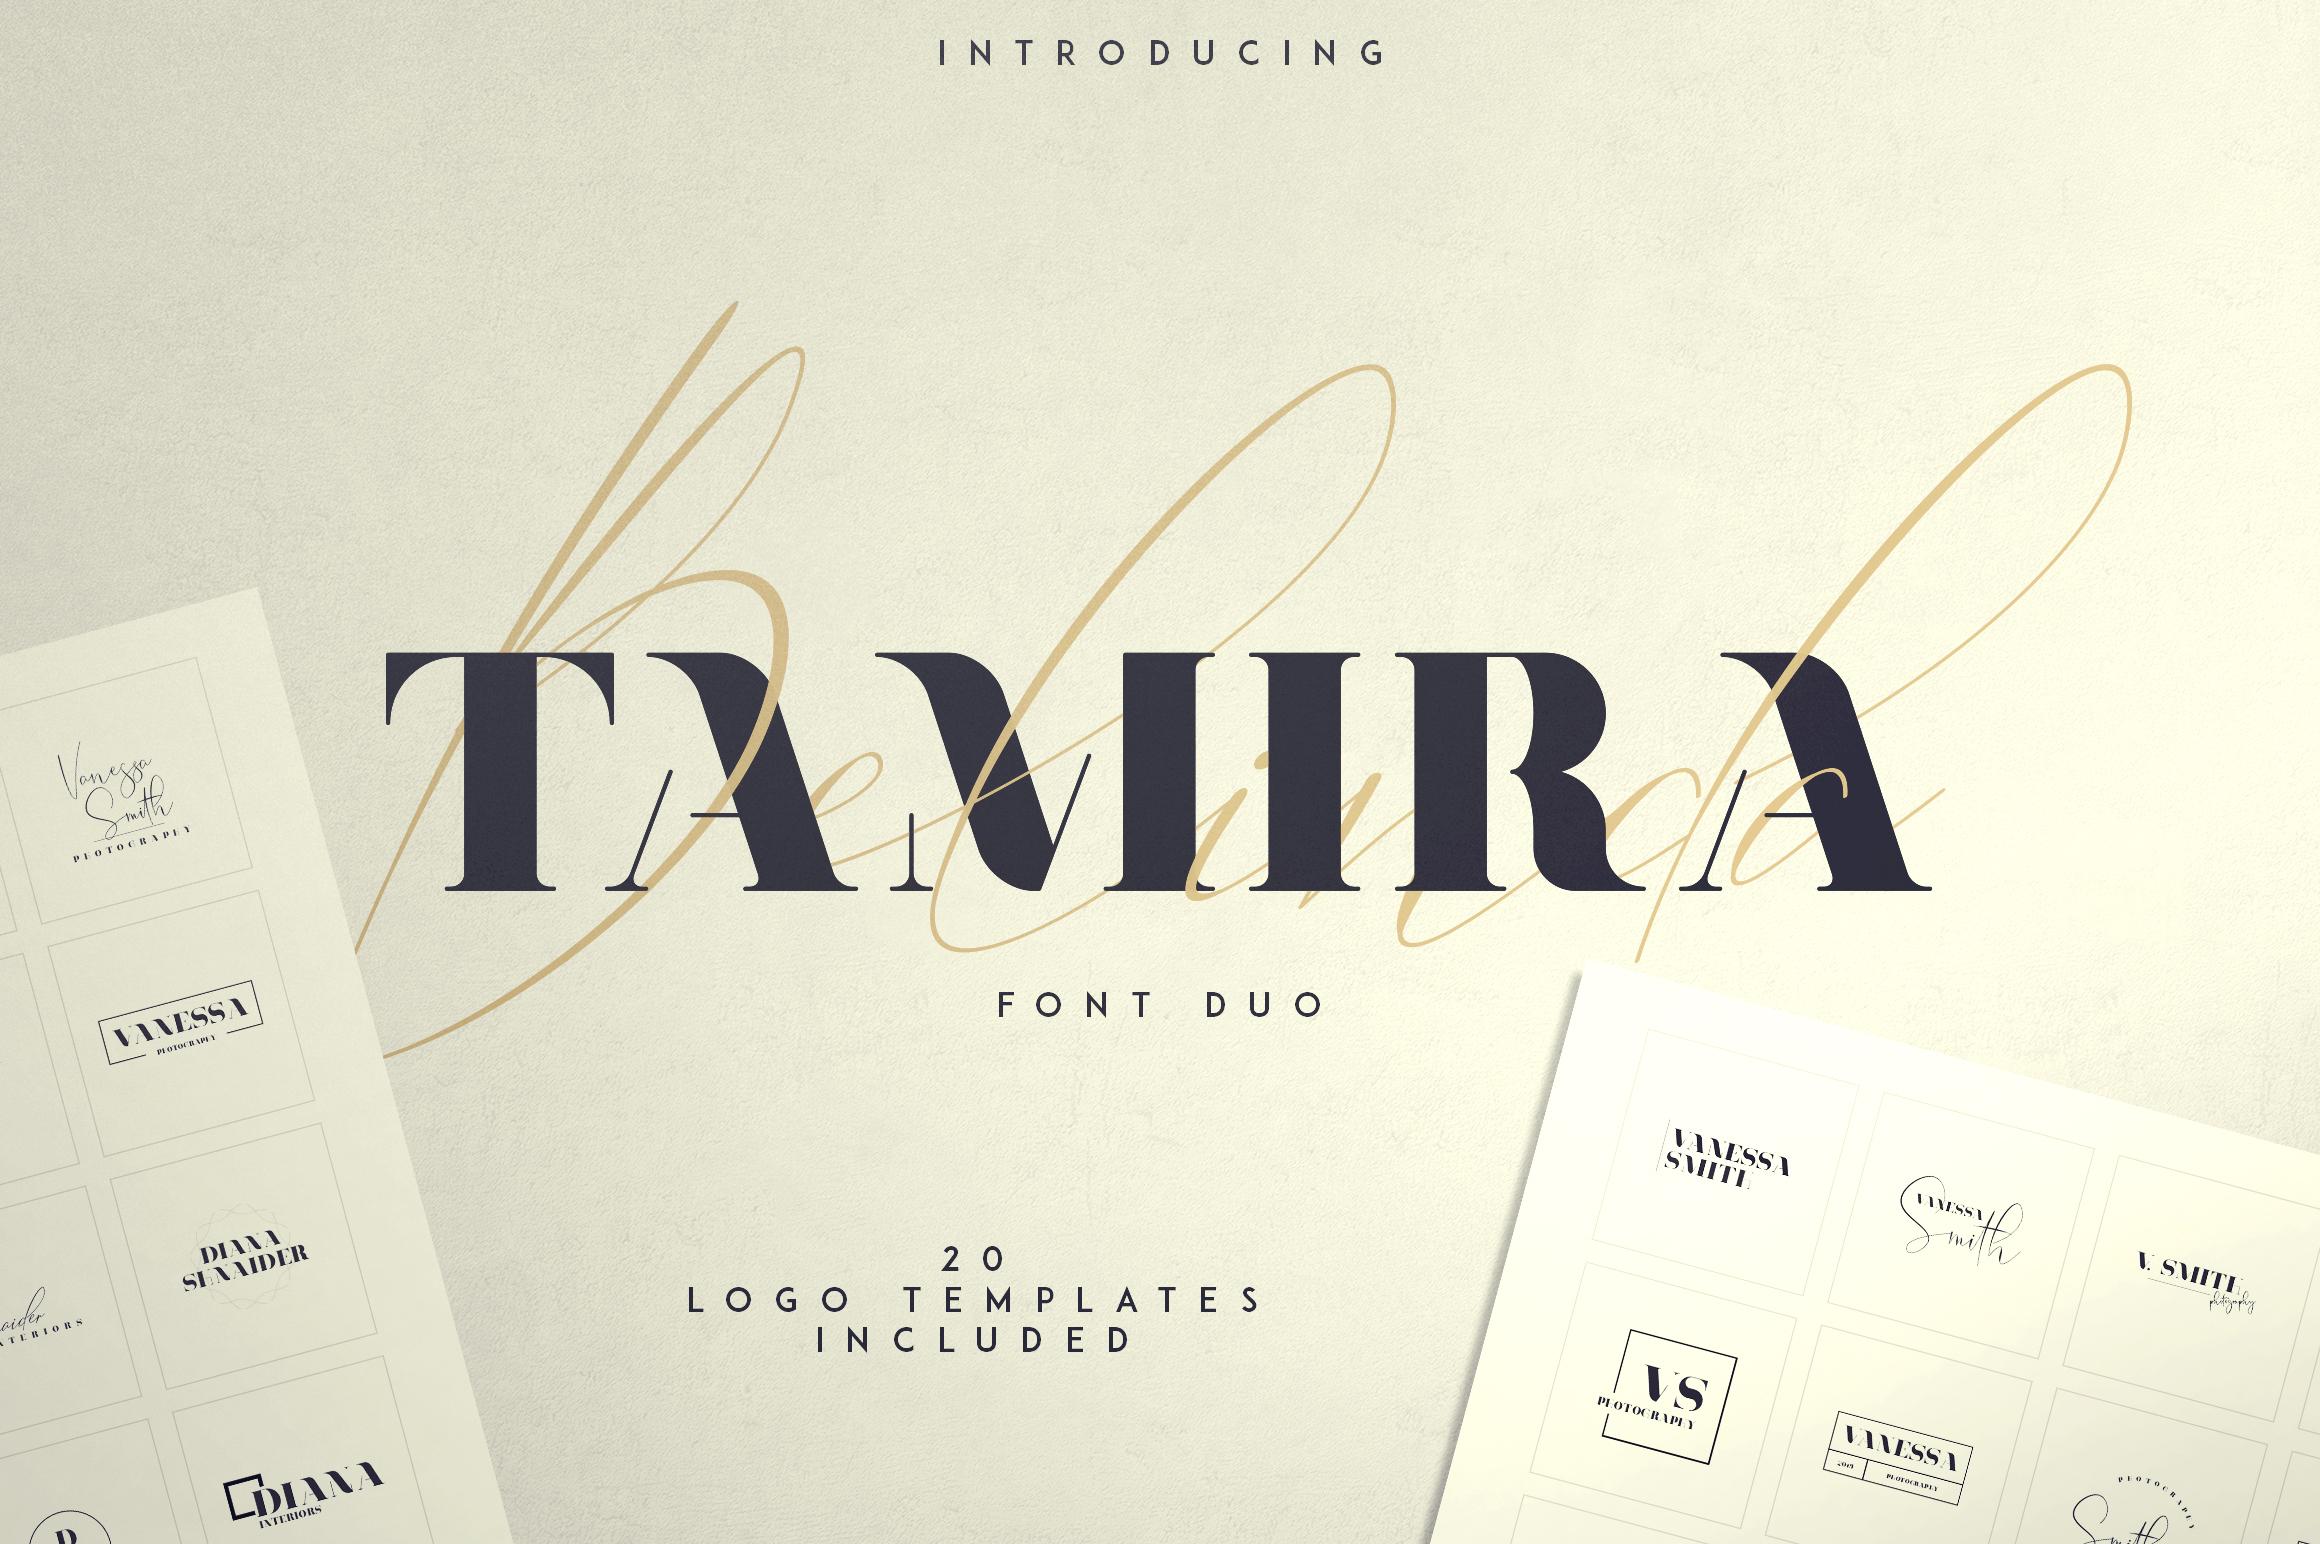 Belinda Tamira - Font duo 20 Logos example image 1